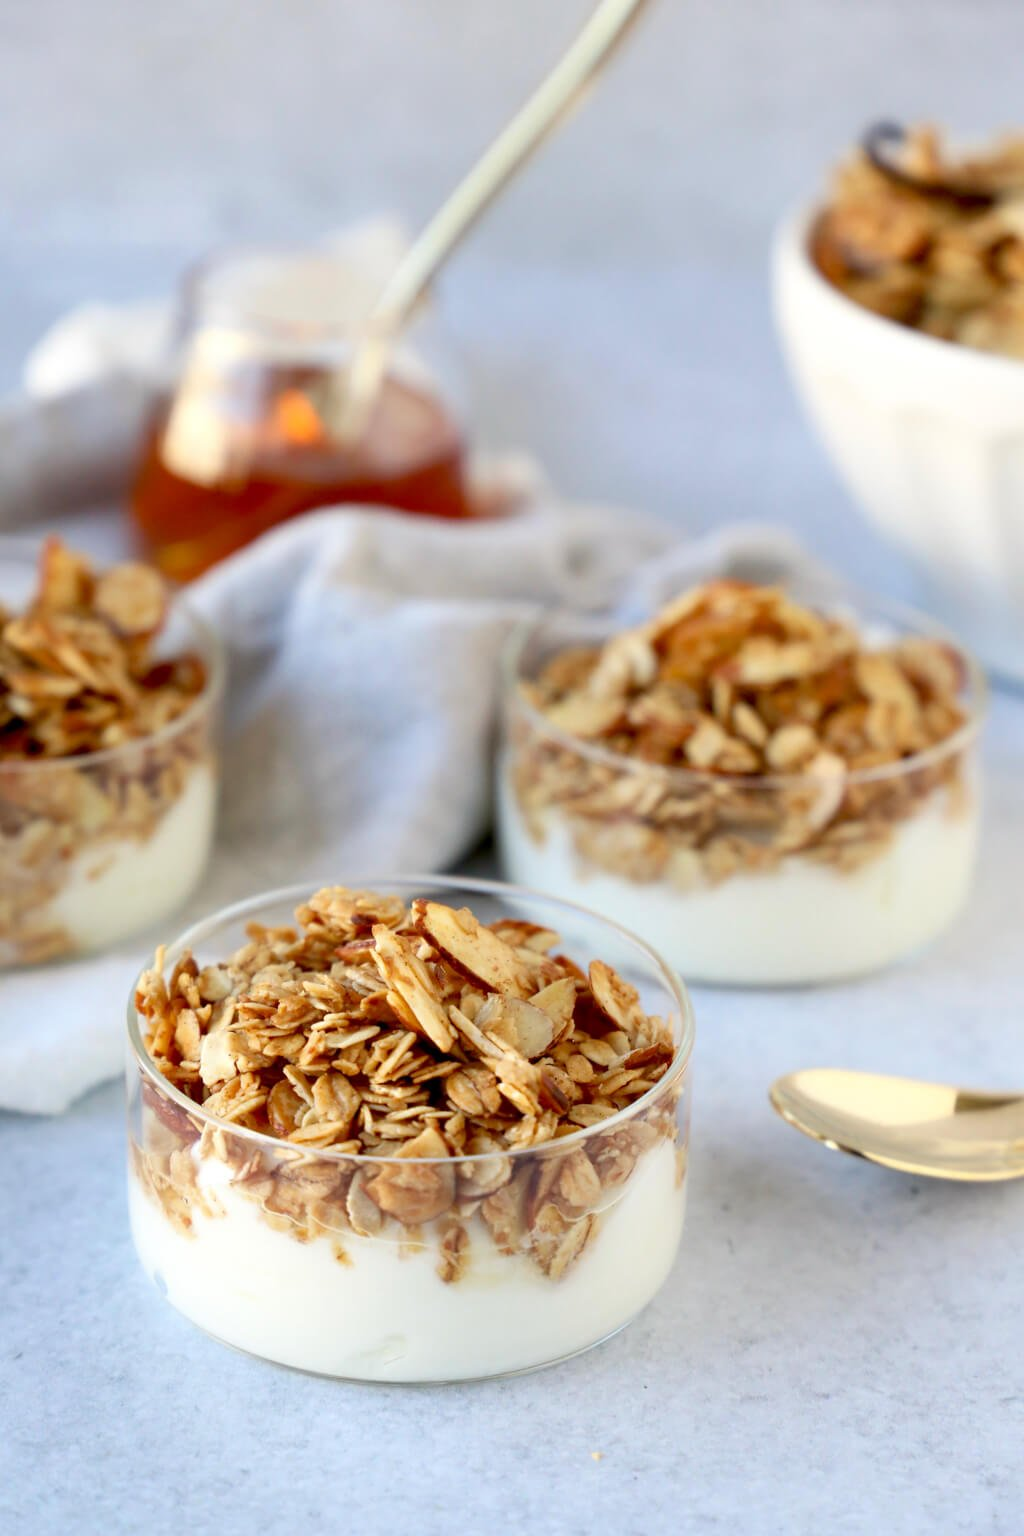 Three bowls of yogurt parfait topped with granola and honey